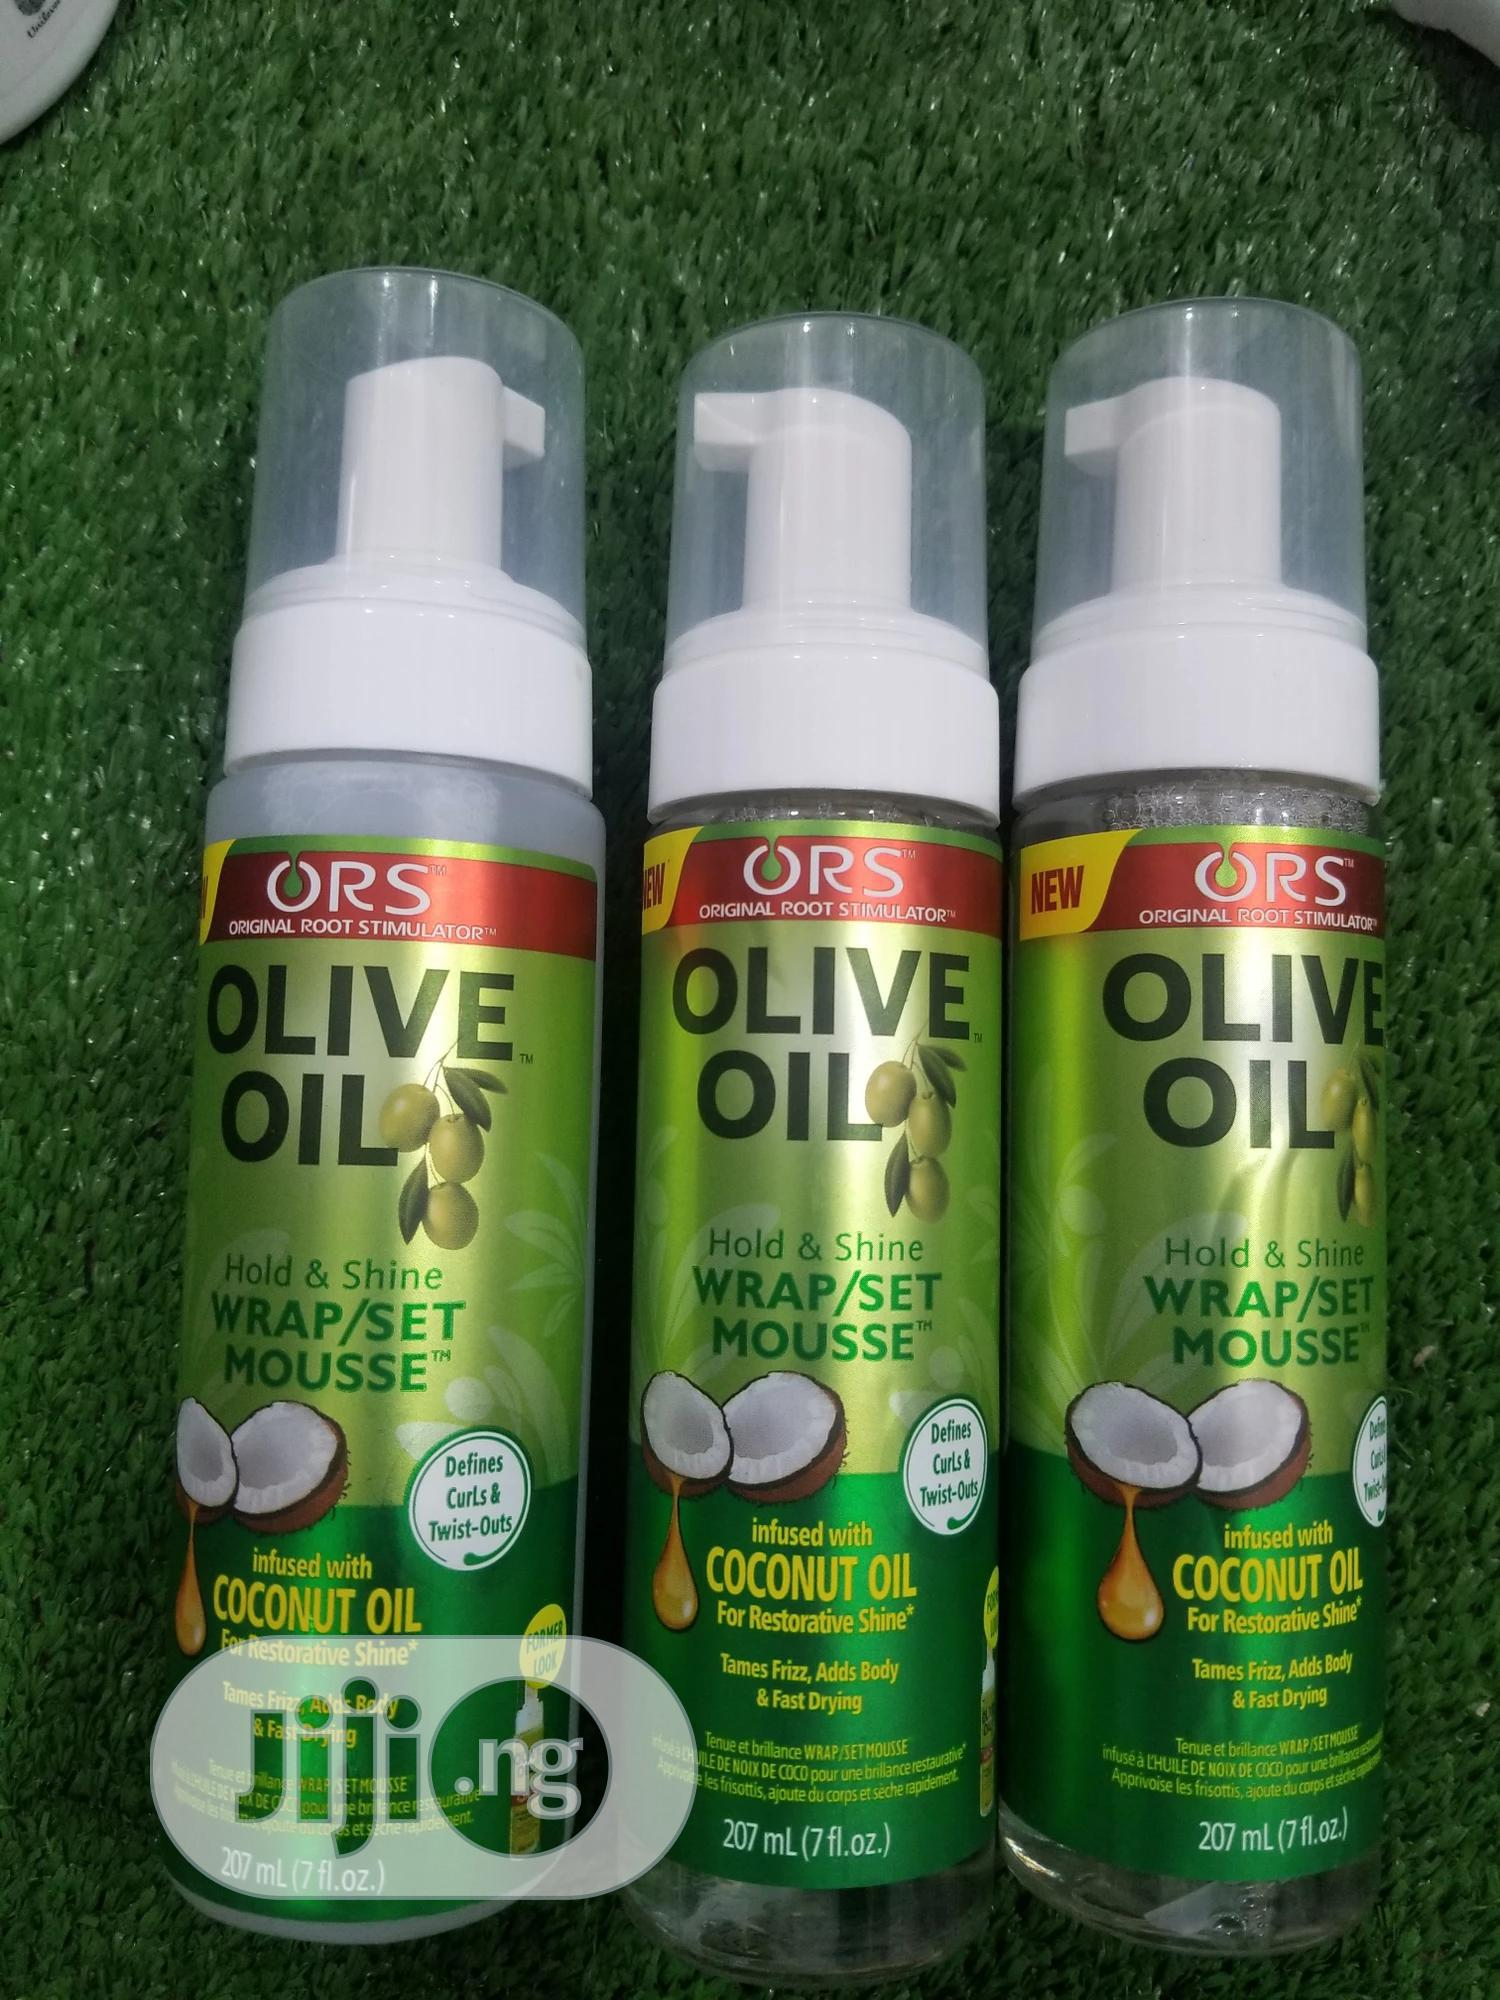 Olive Oil Mousse